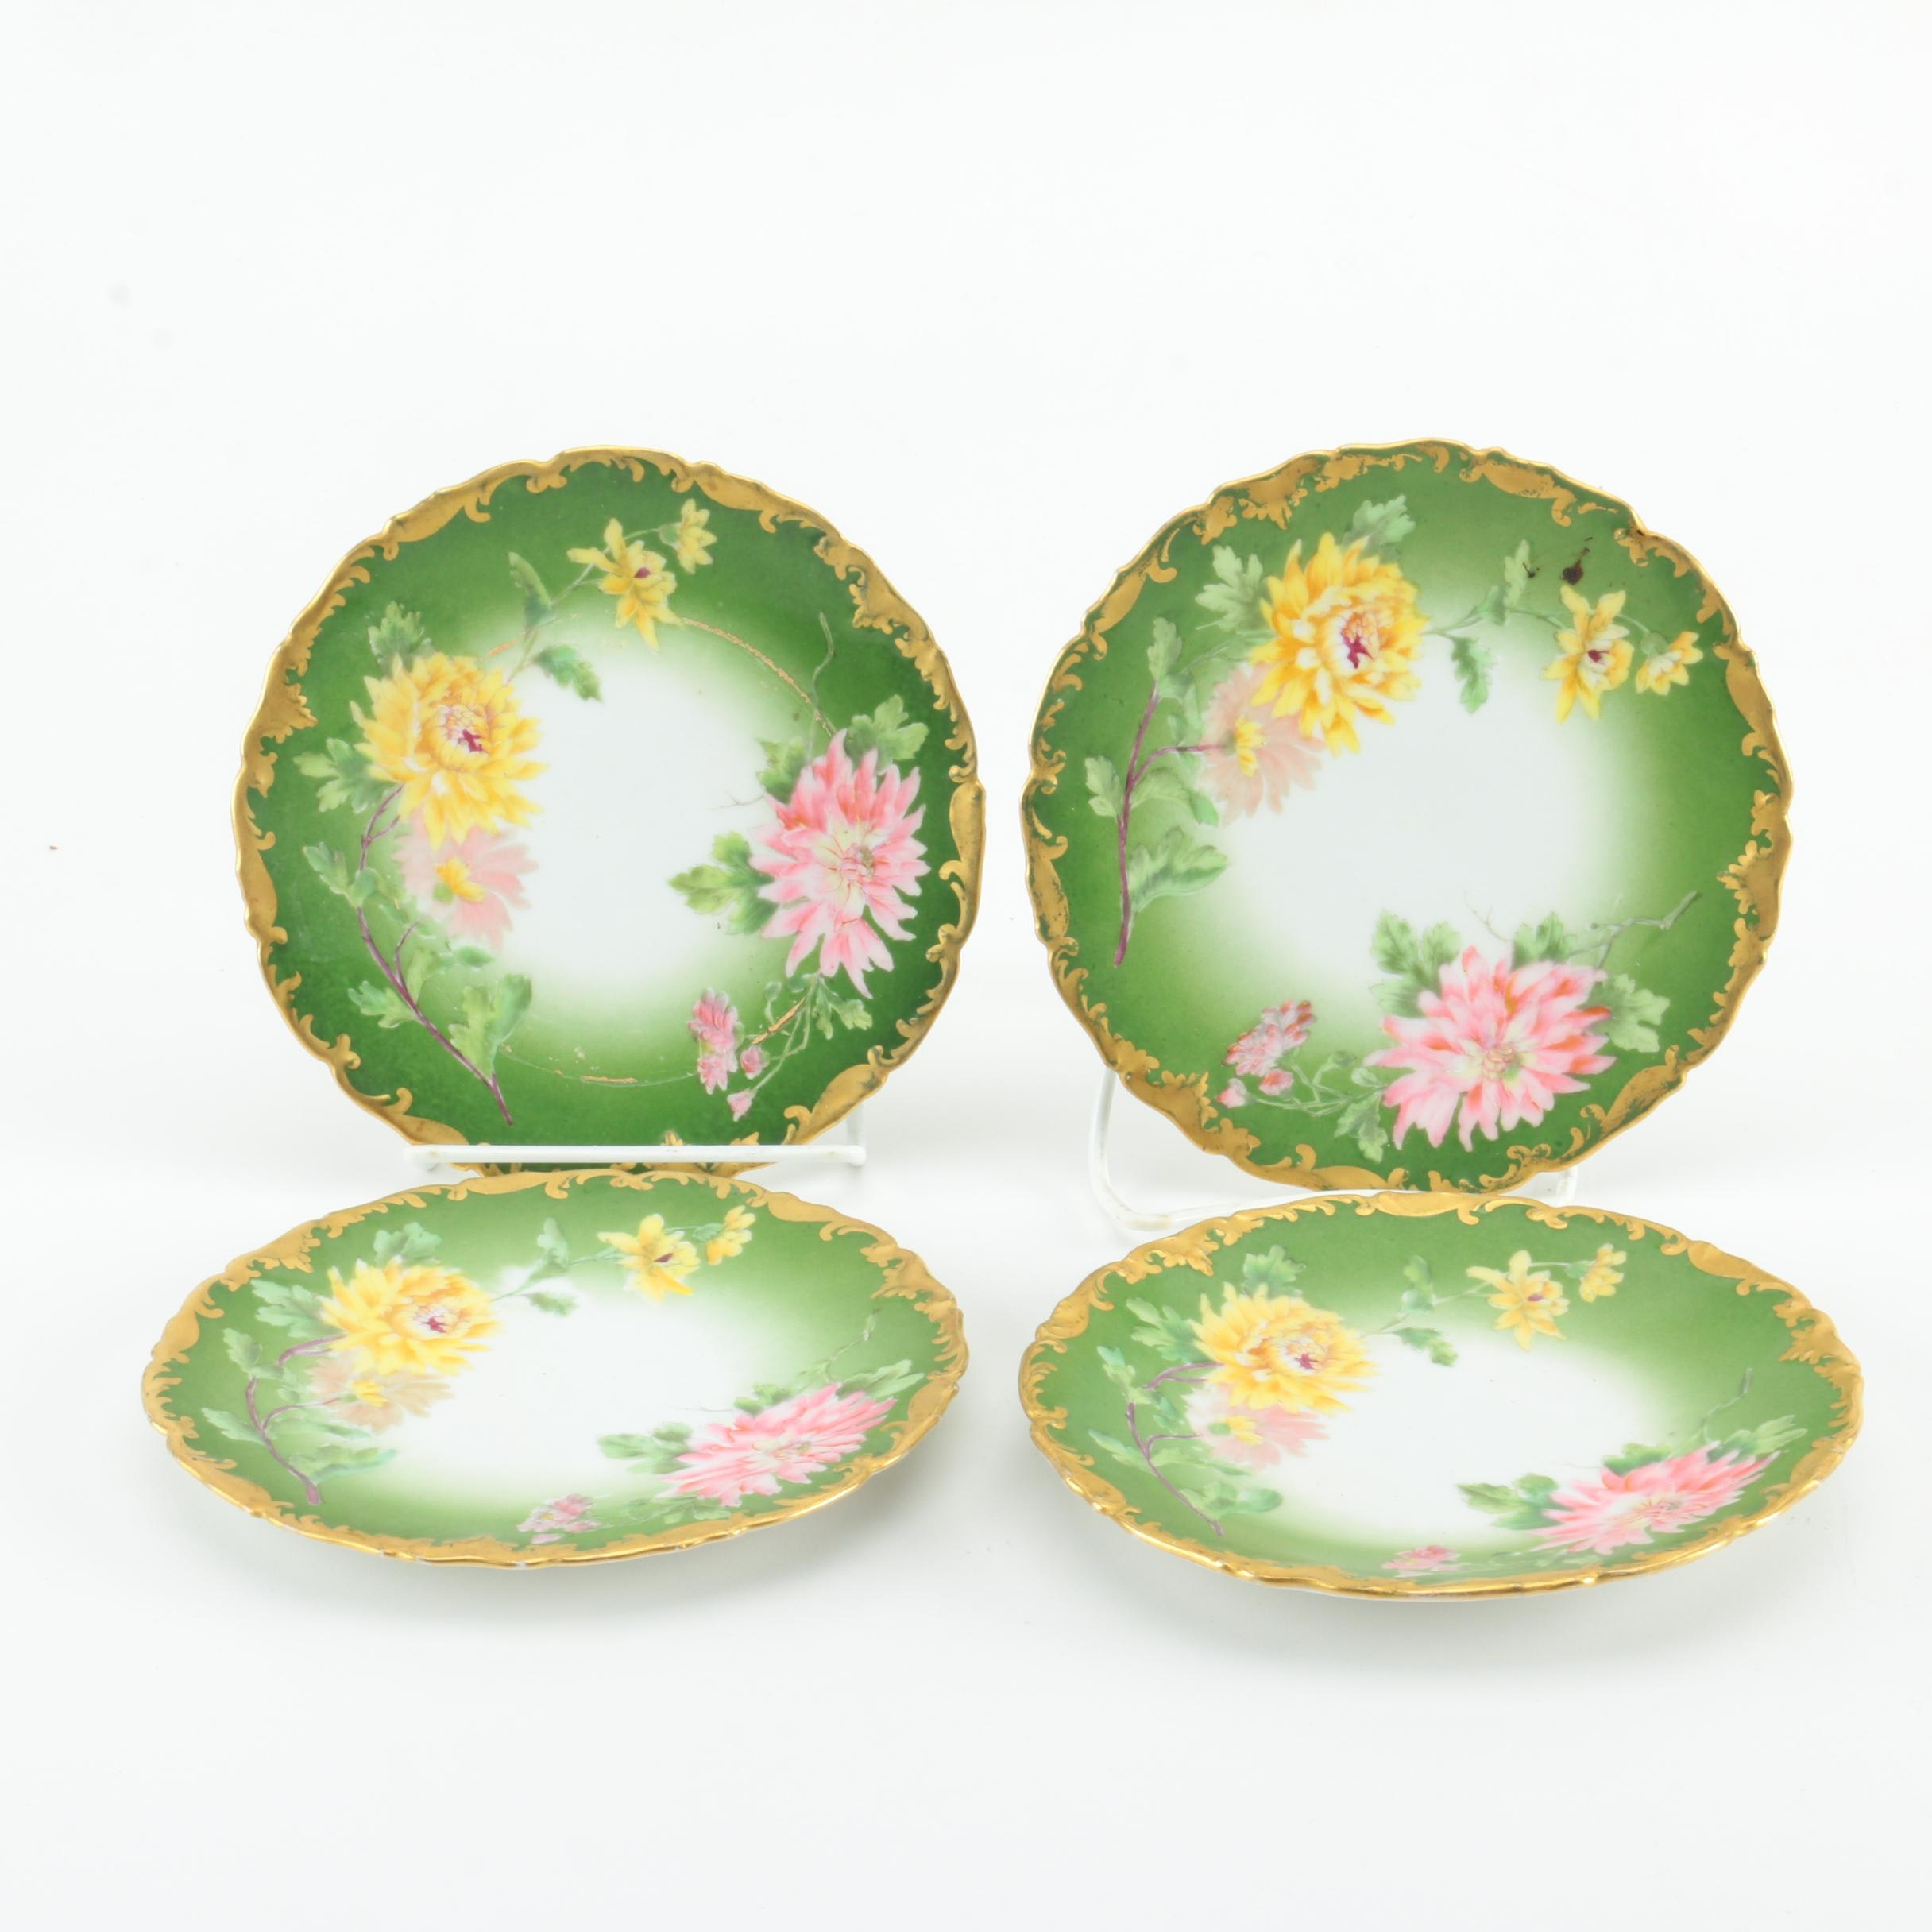 Early 20th Century Tressemann & Vogt Porcelain Plates